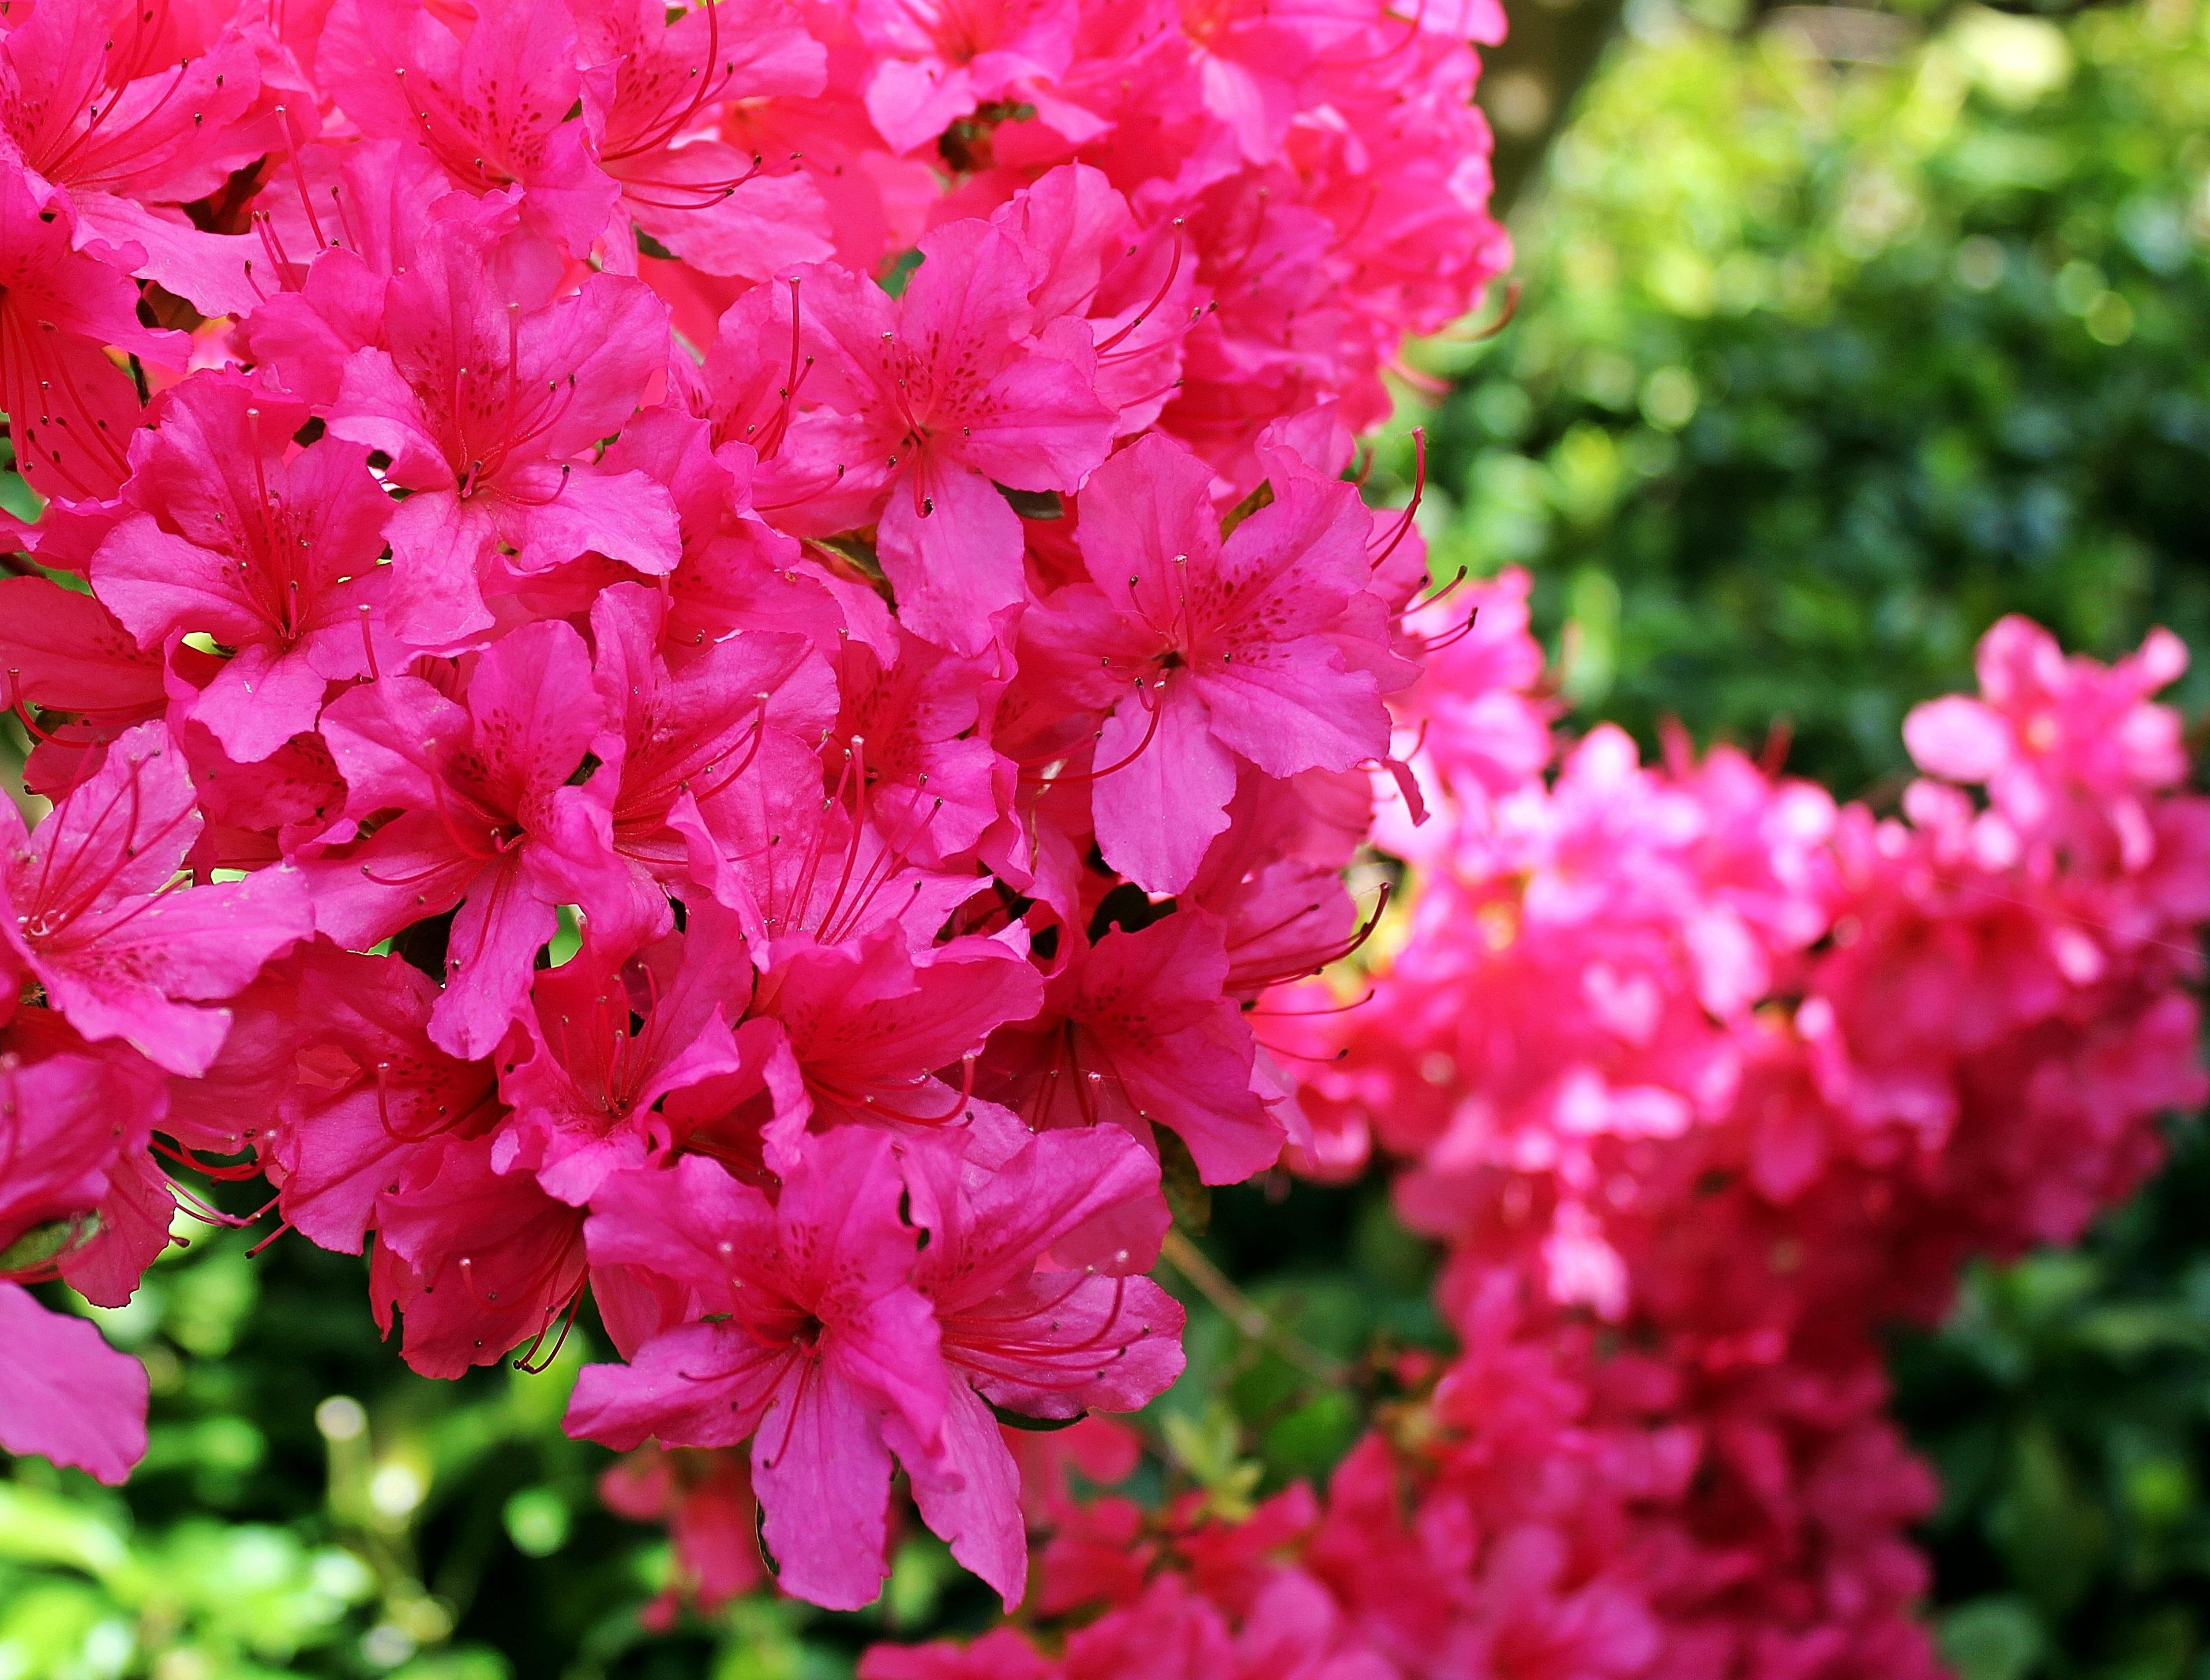 Free Images Blossom Flower Petal Summer Bush Spring Garden